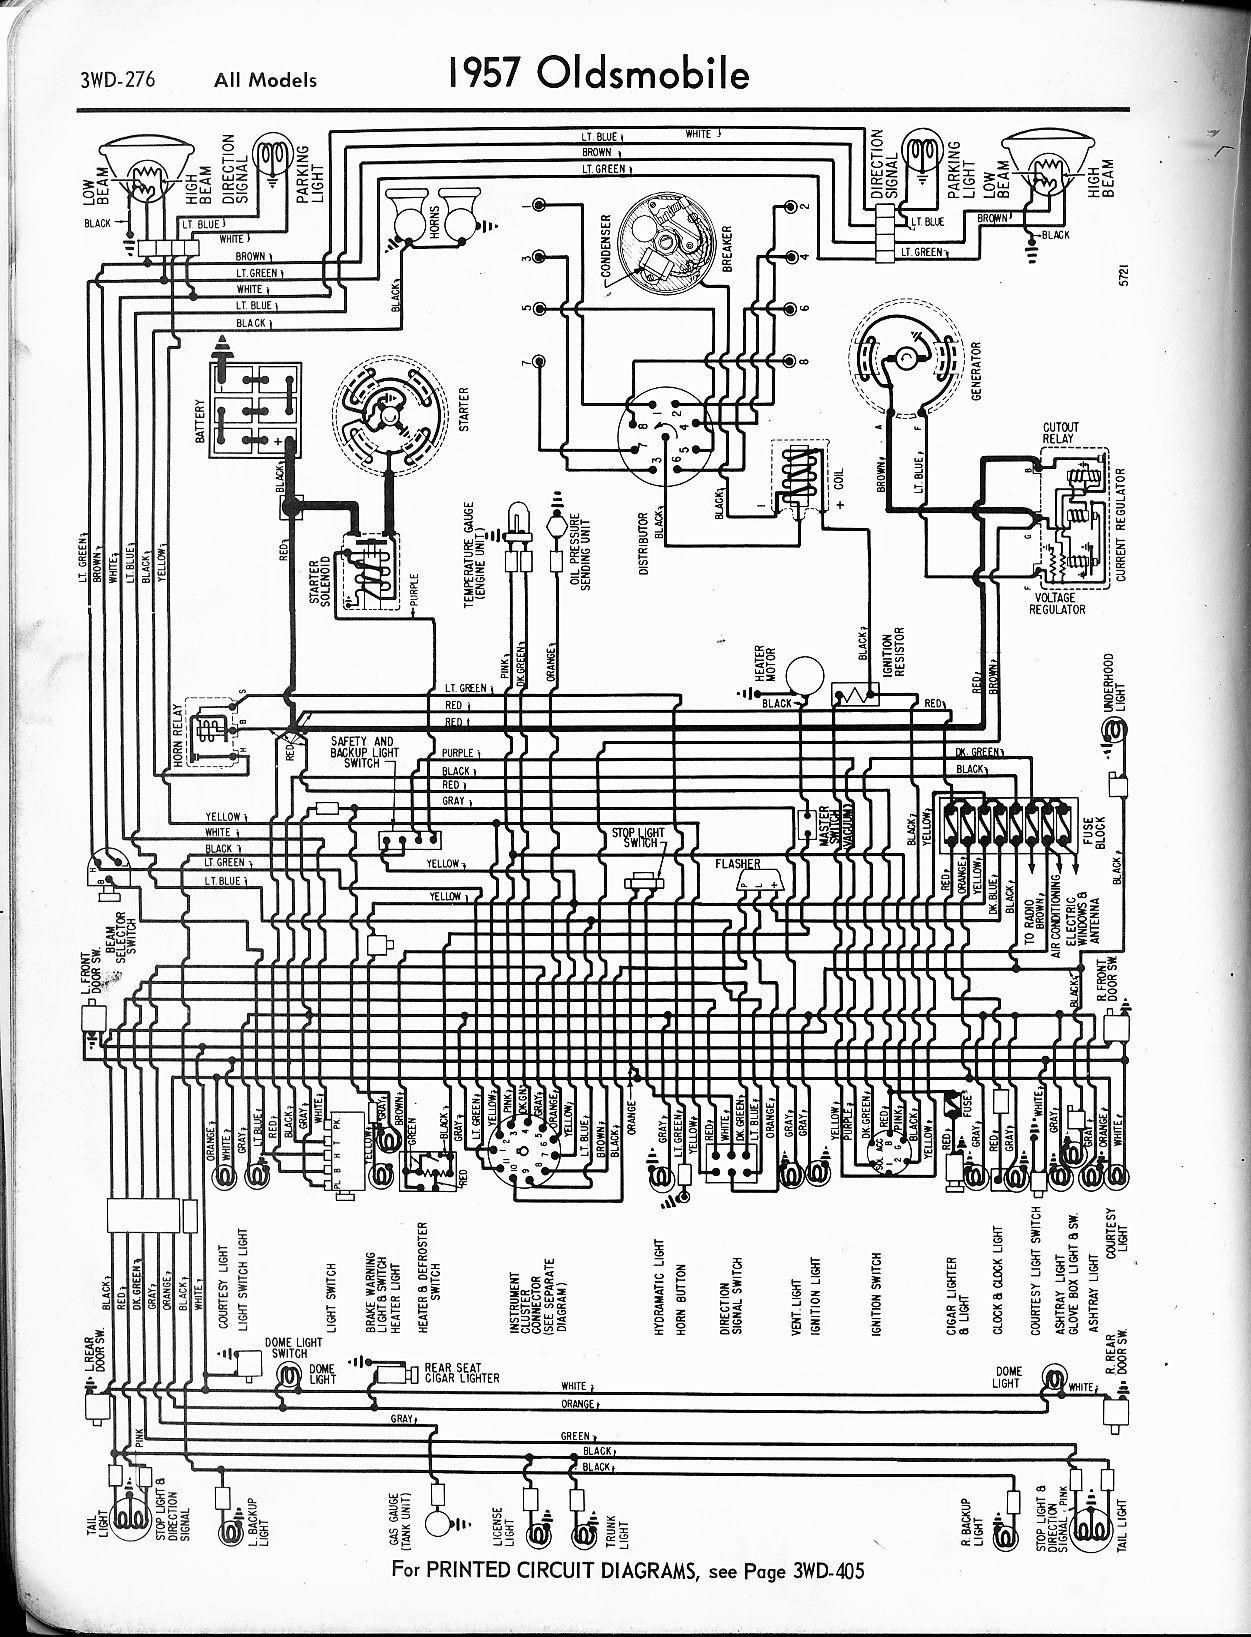 Pontiac 3800 Engine Diagram Wiring Diagram Besides 1996 Oldsmobile Cutlass Engine Wiring Diagram Of Pontiac 3800 Engine Diagram